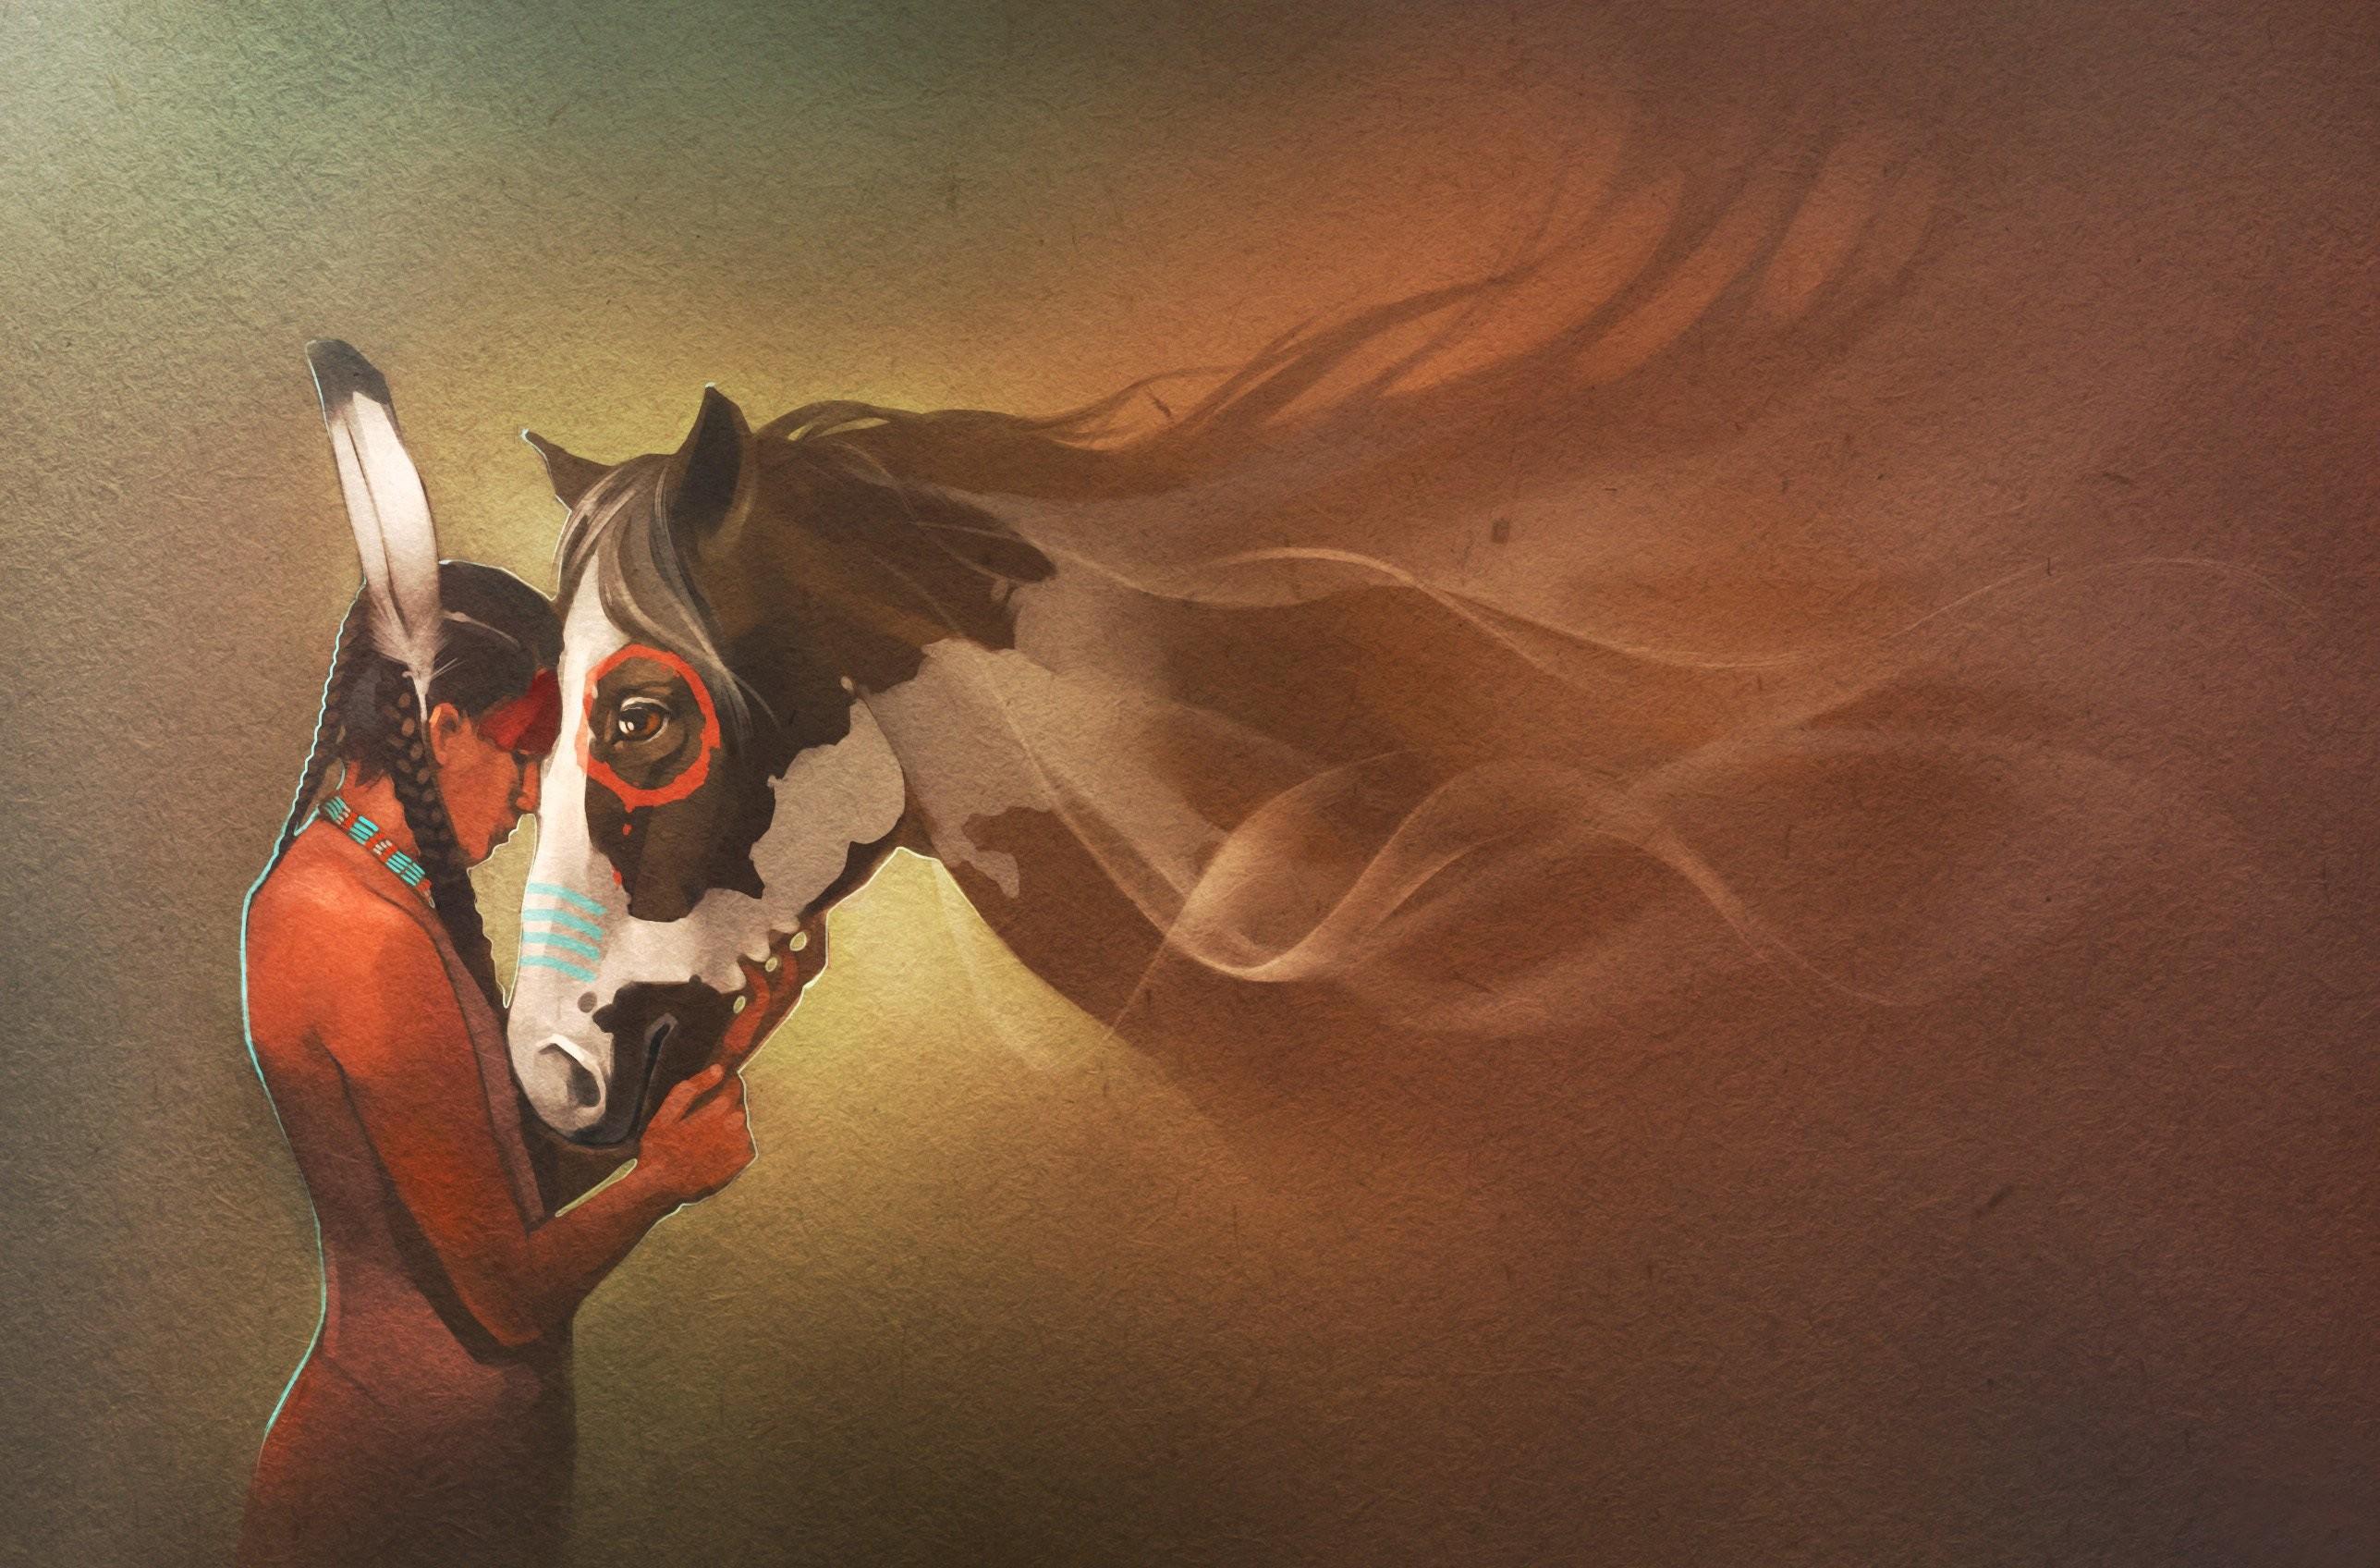 Horses Indian Animals Mood Western Nativew Horse Wallpaper Native American Wallpaper Art 2575x1696 Wallpaper Teahub Io